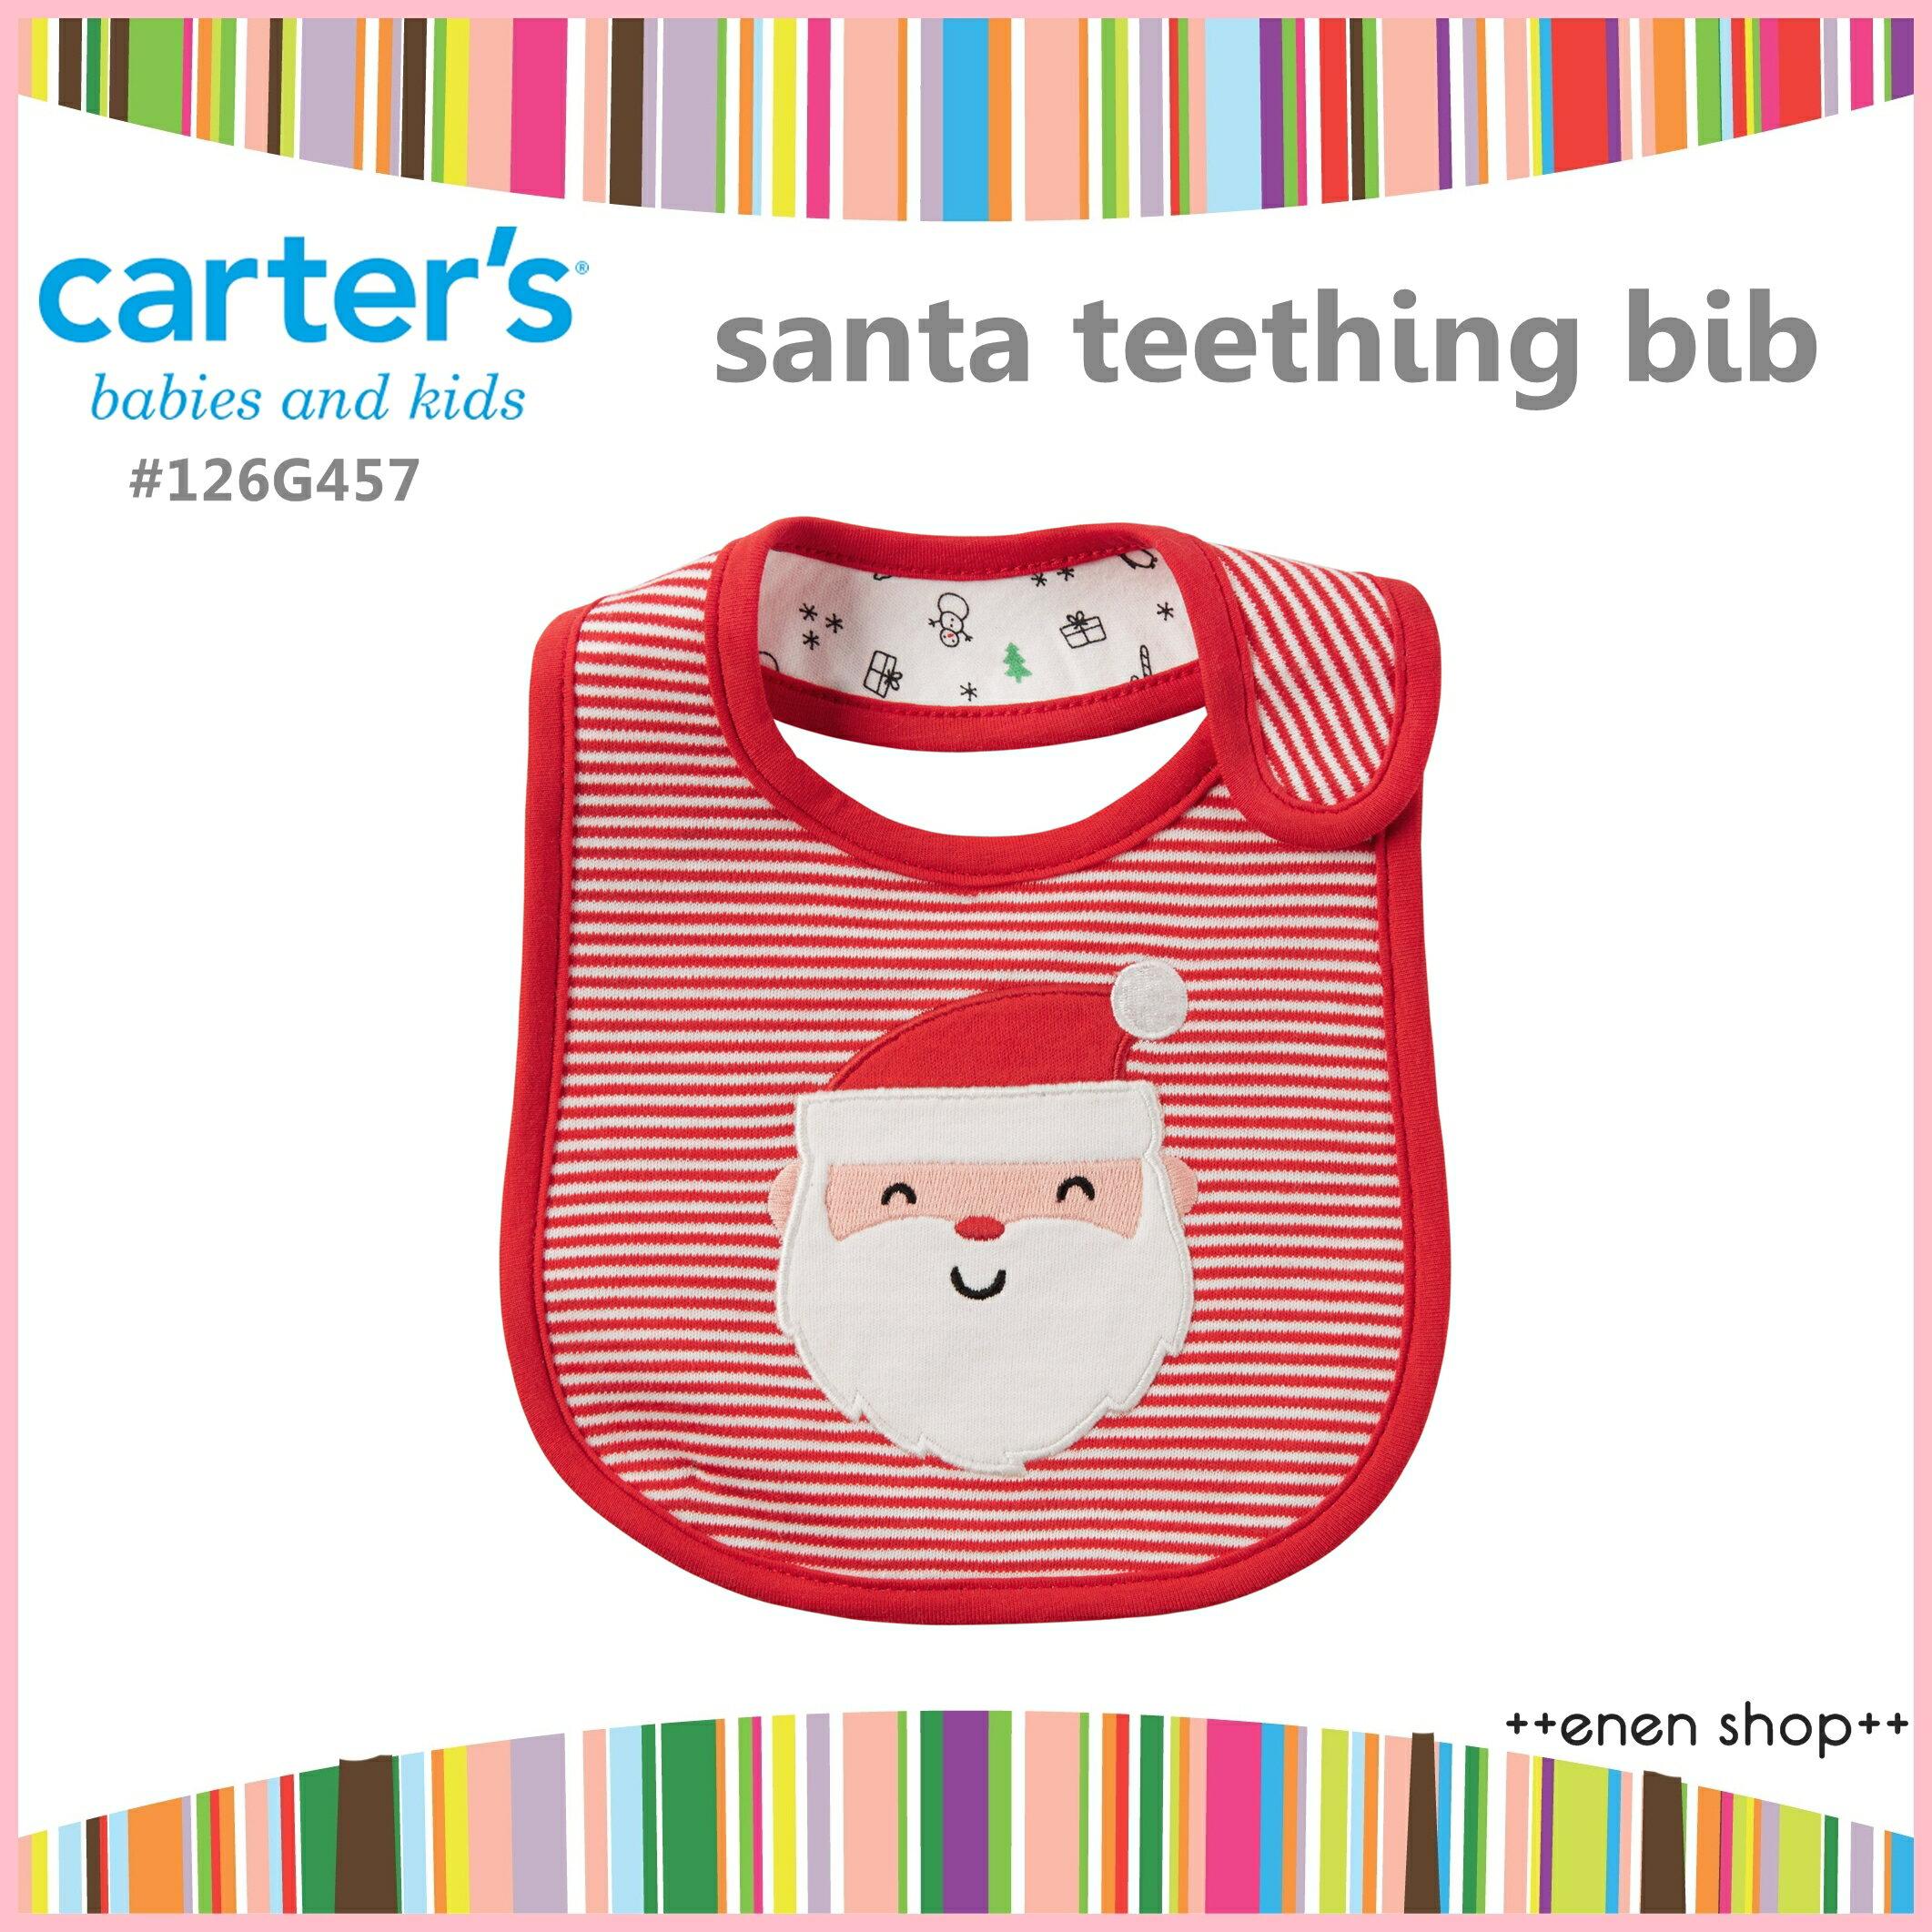 Enen Shop @Carter's 可愛聖誕老公公口水巾/圍兜兜 雙面圖案 #126G457 新生兒/彌月禮